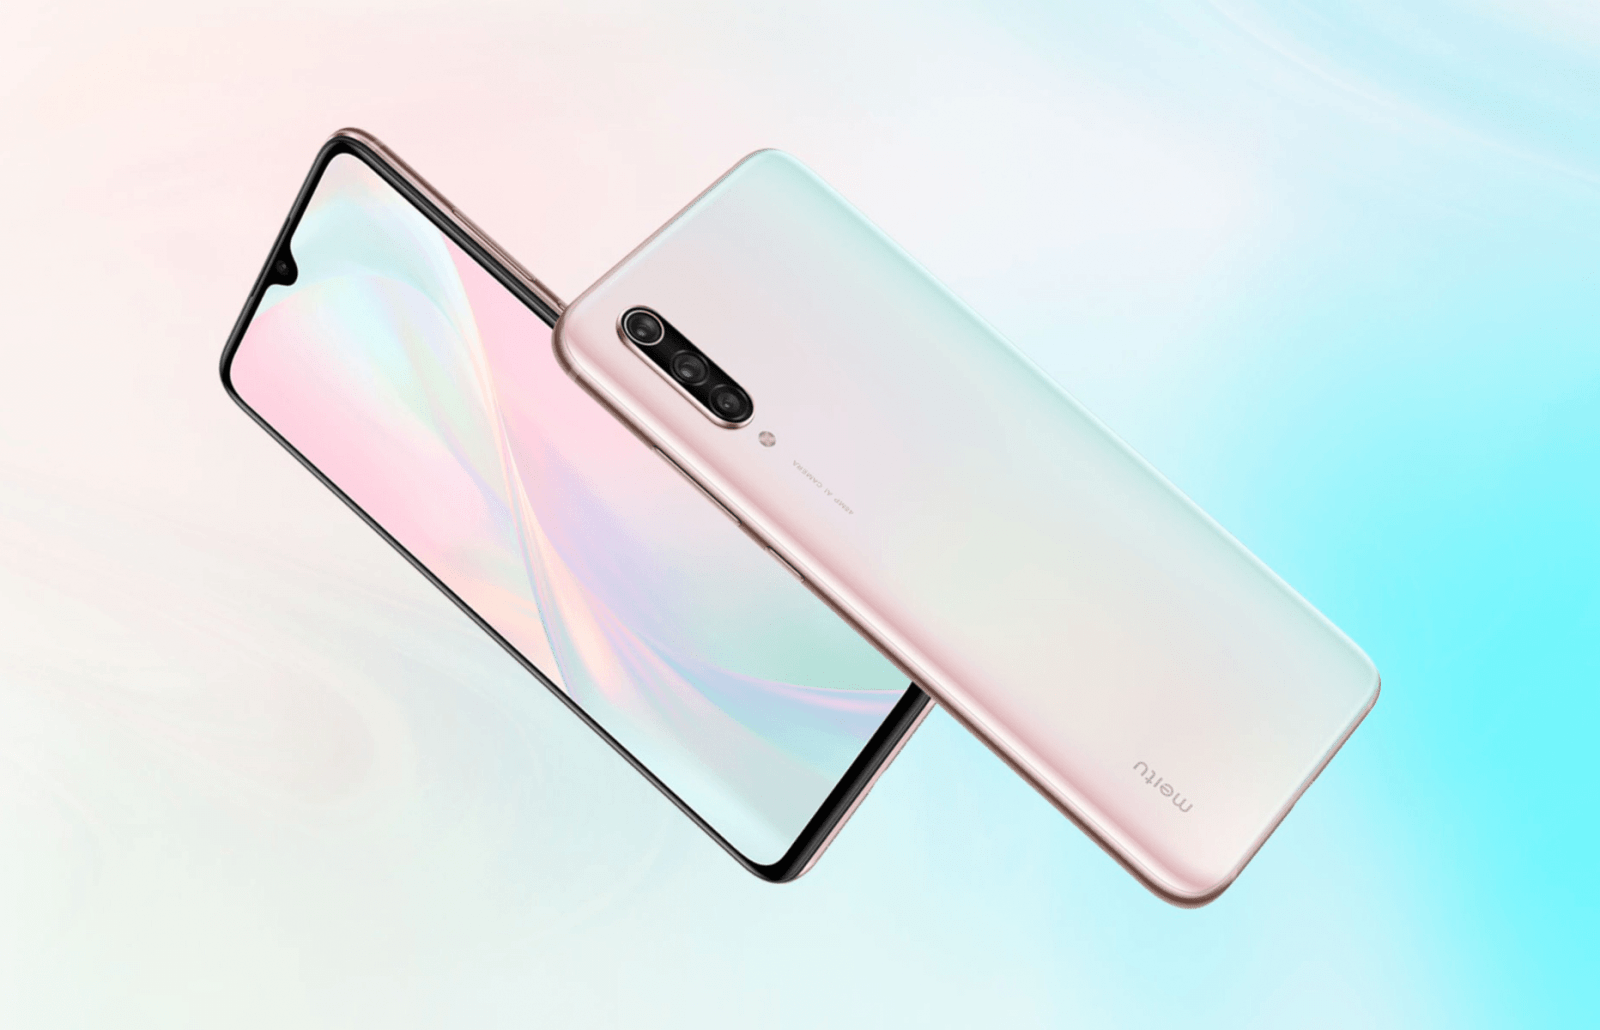 Опубликованы характеристики 108-мегапиксельного смартфона Xiaomi Mi CC9 Pro (cc9 meitu picture1 0 large large large)